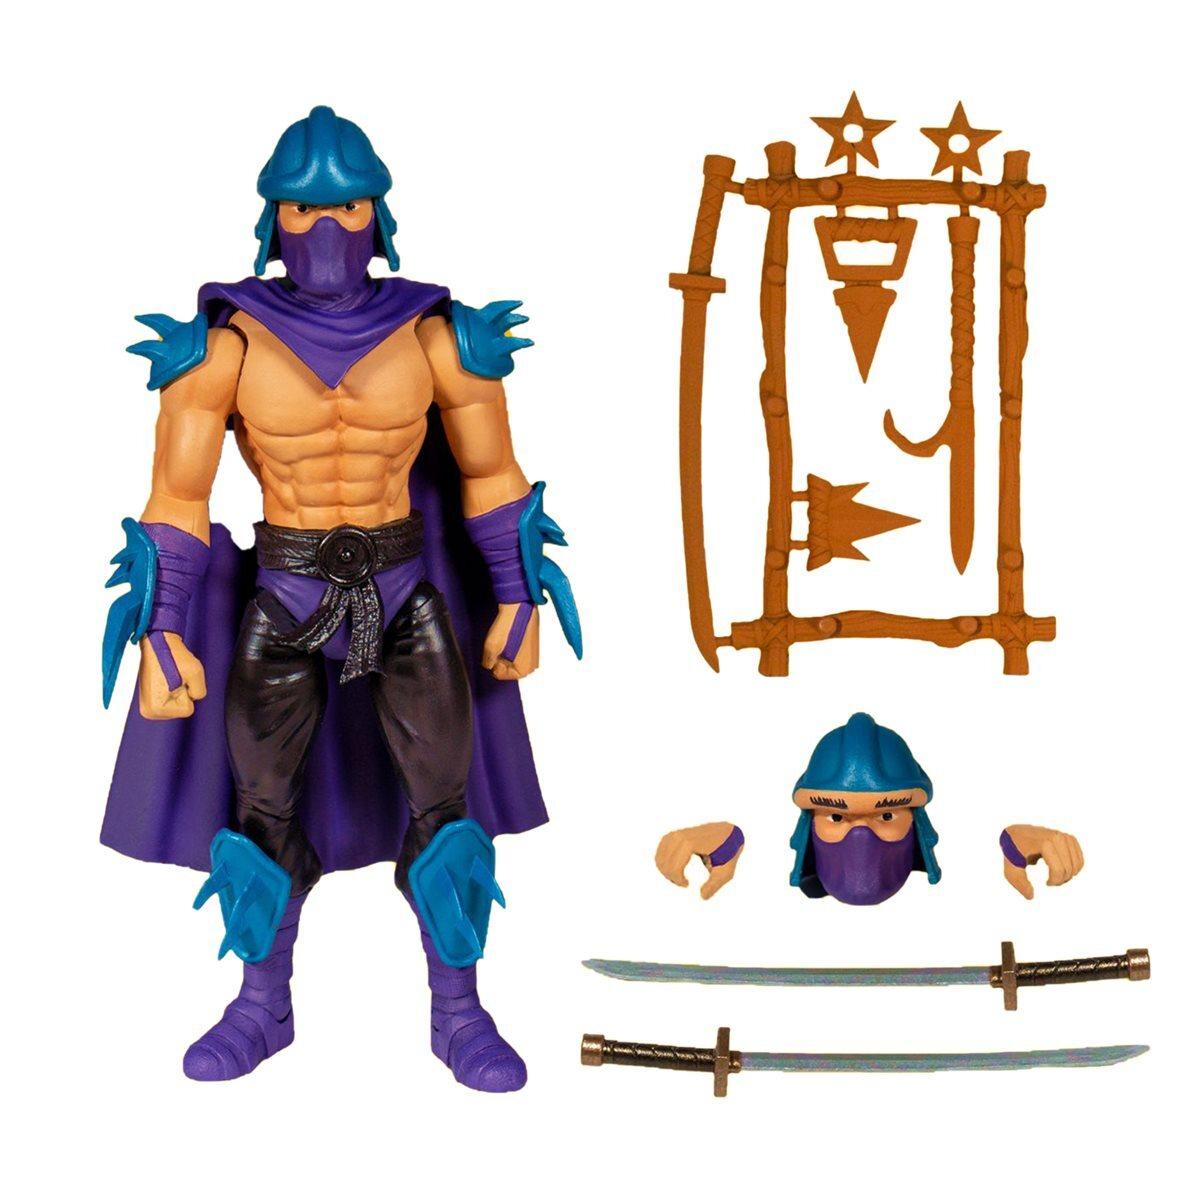 *PREORDER* Teenage Mutant Ninja Turtles: Ultimates Action Figure EVIL SHREDDER by Super 7